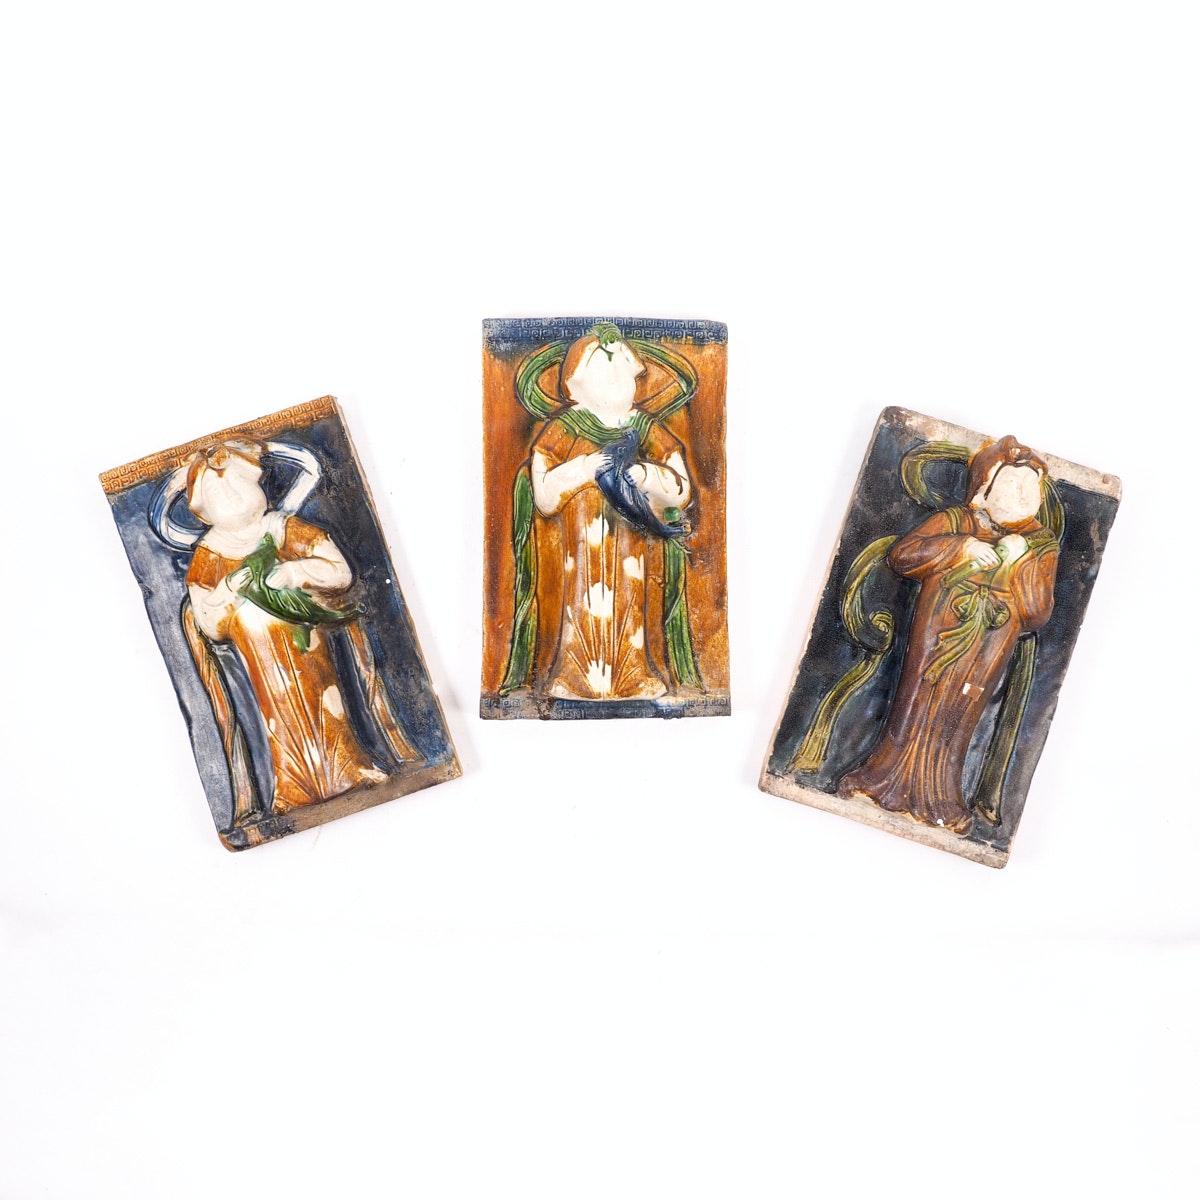 Set of Three Vintage Chinese Ceramic Figural Tiles